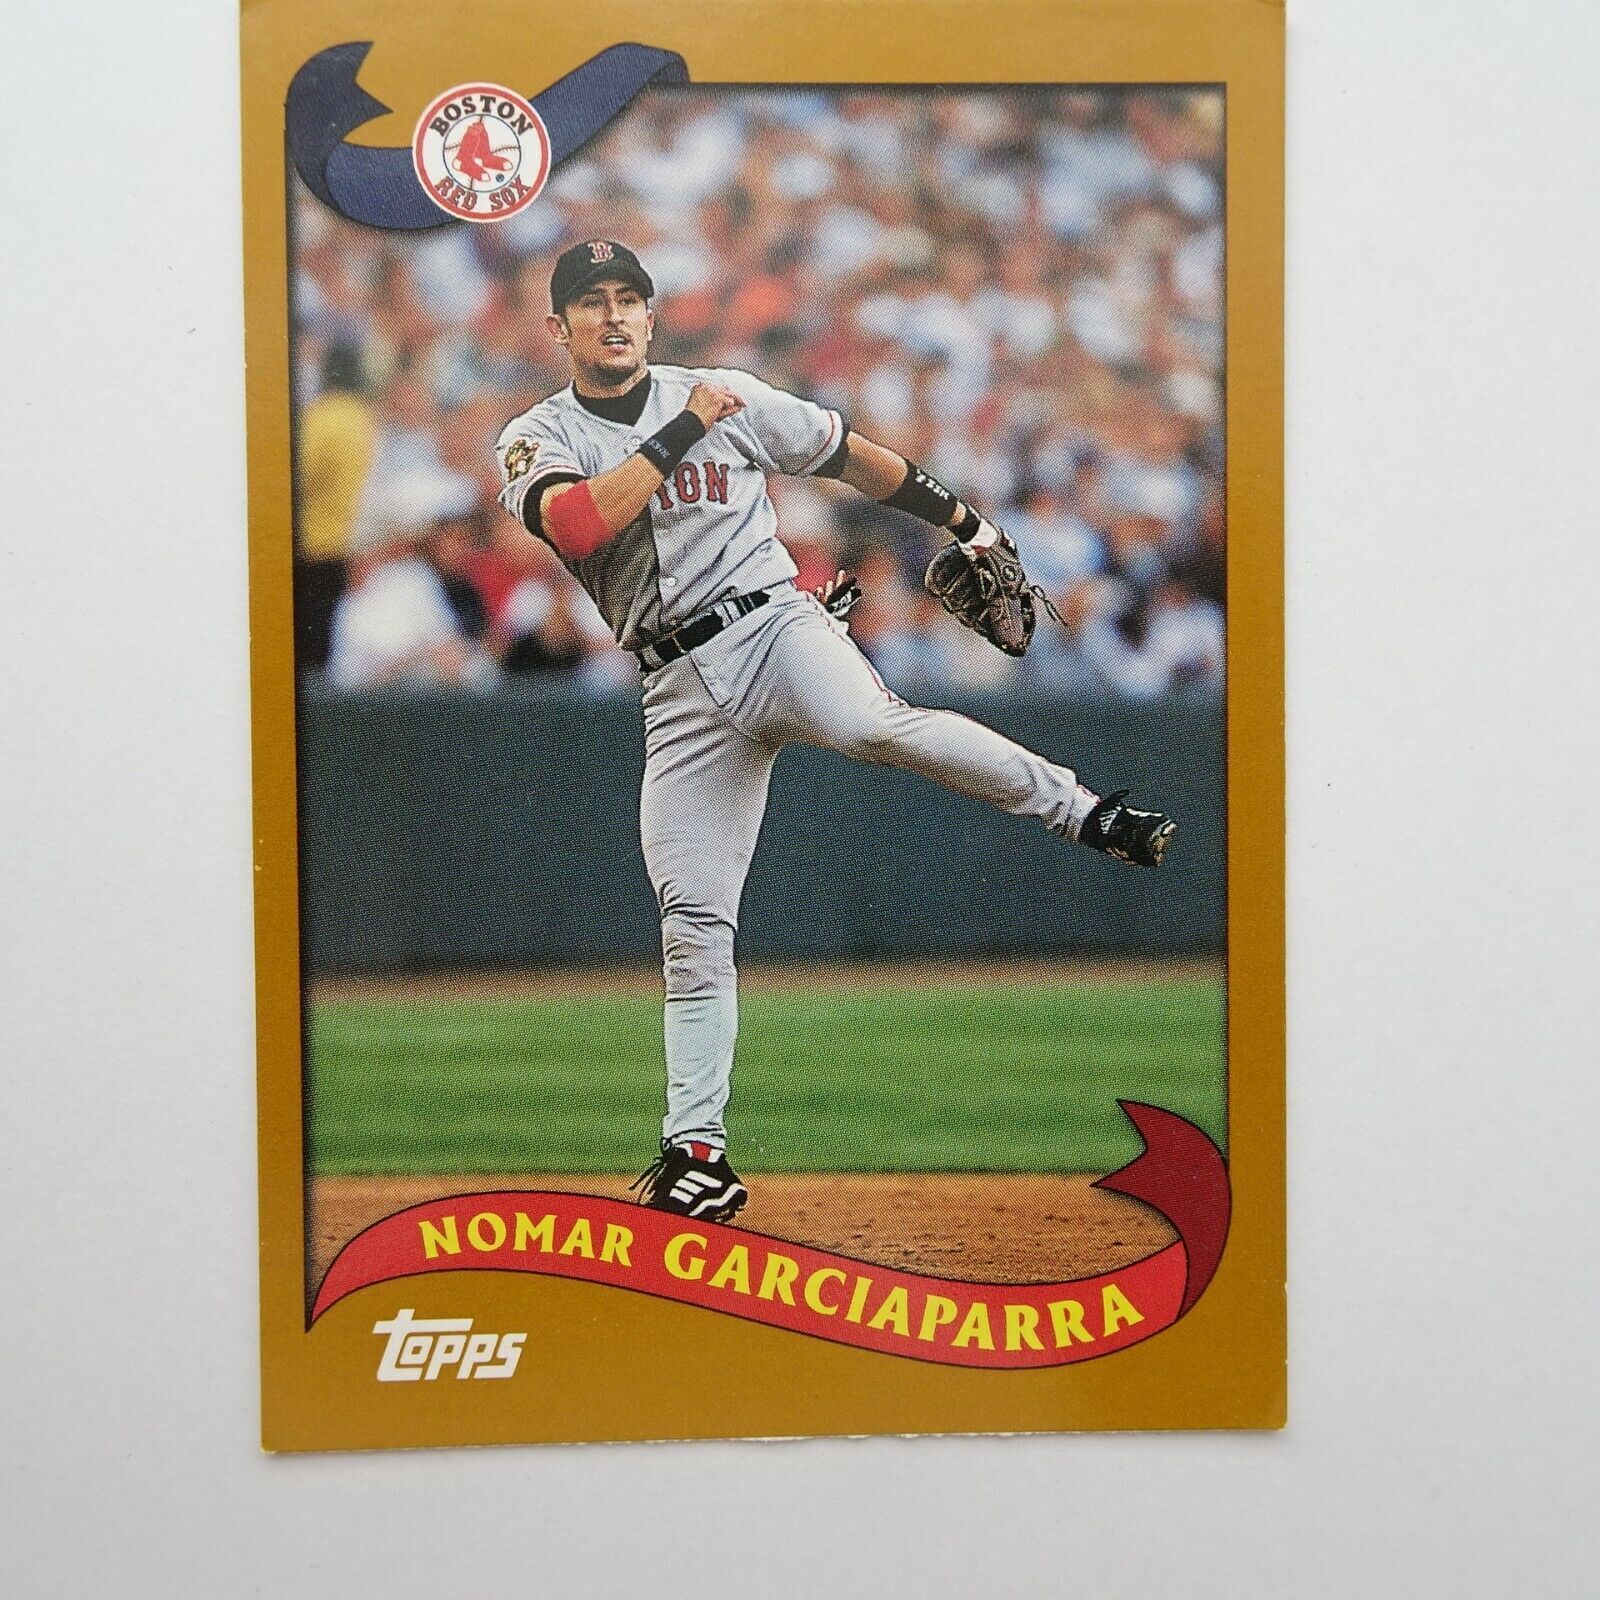 NOMAR GARCIAPARRA #24 Topps x Kanebo GUM 2003 Boston Red Sox